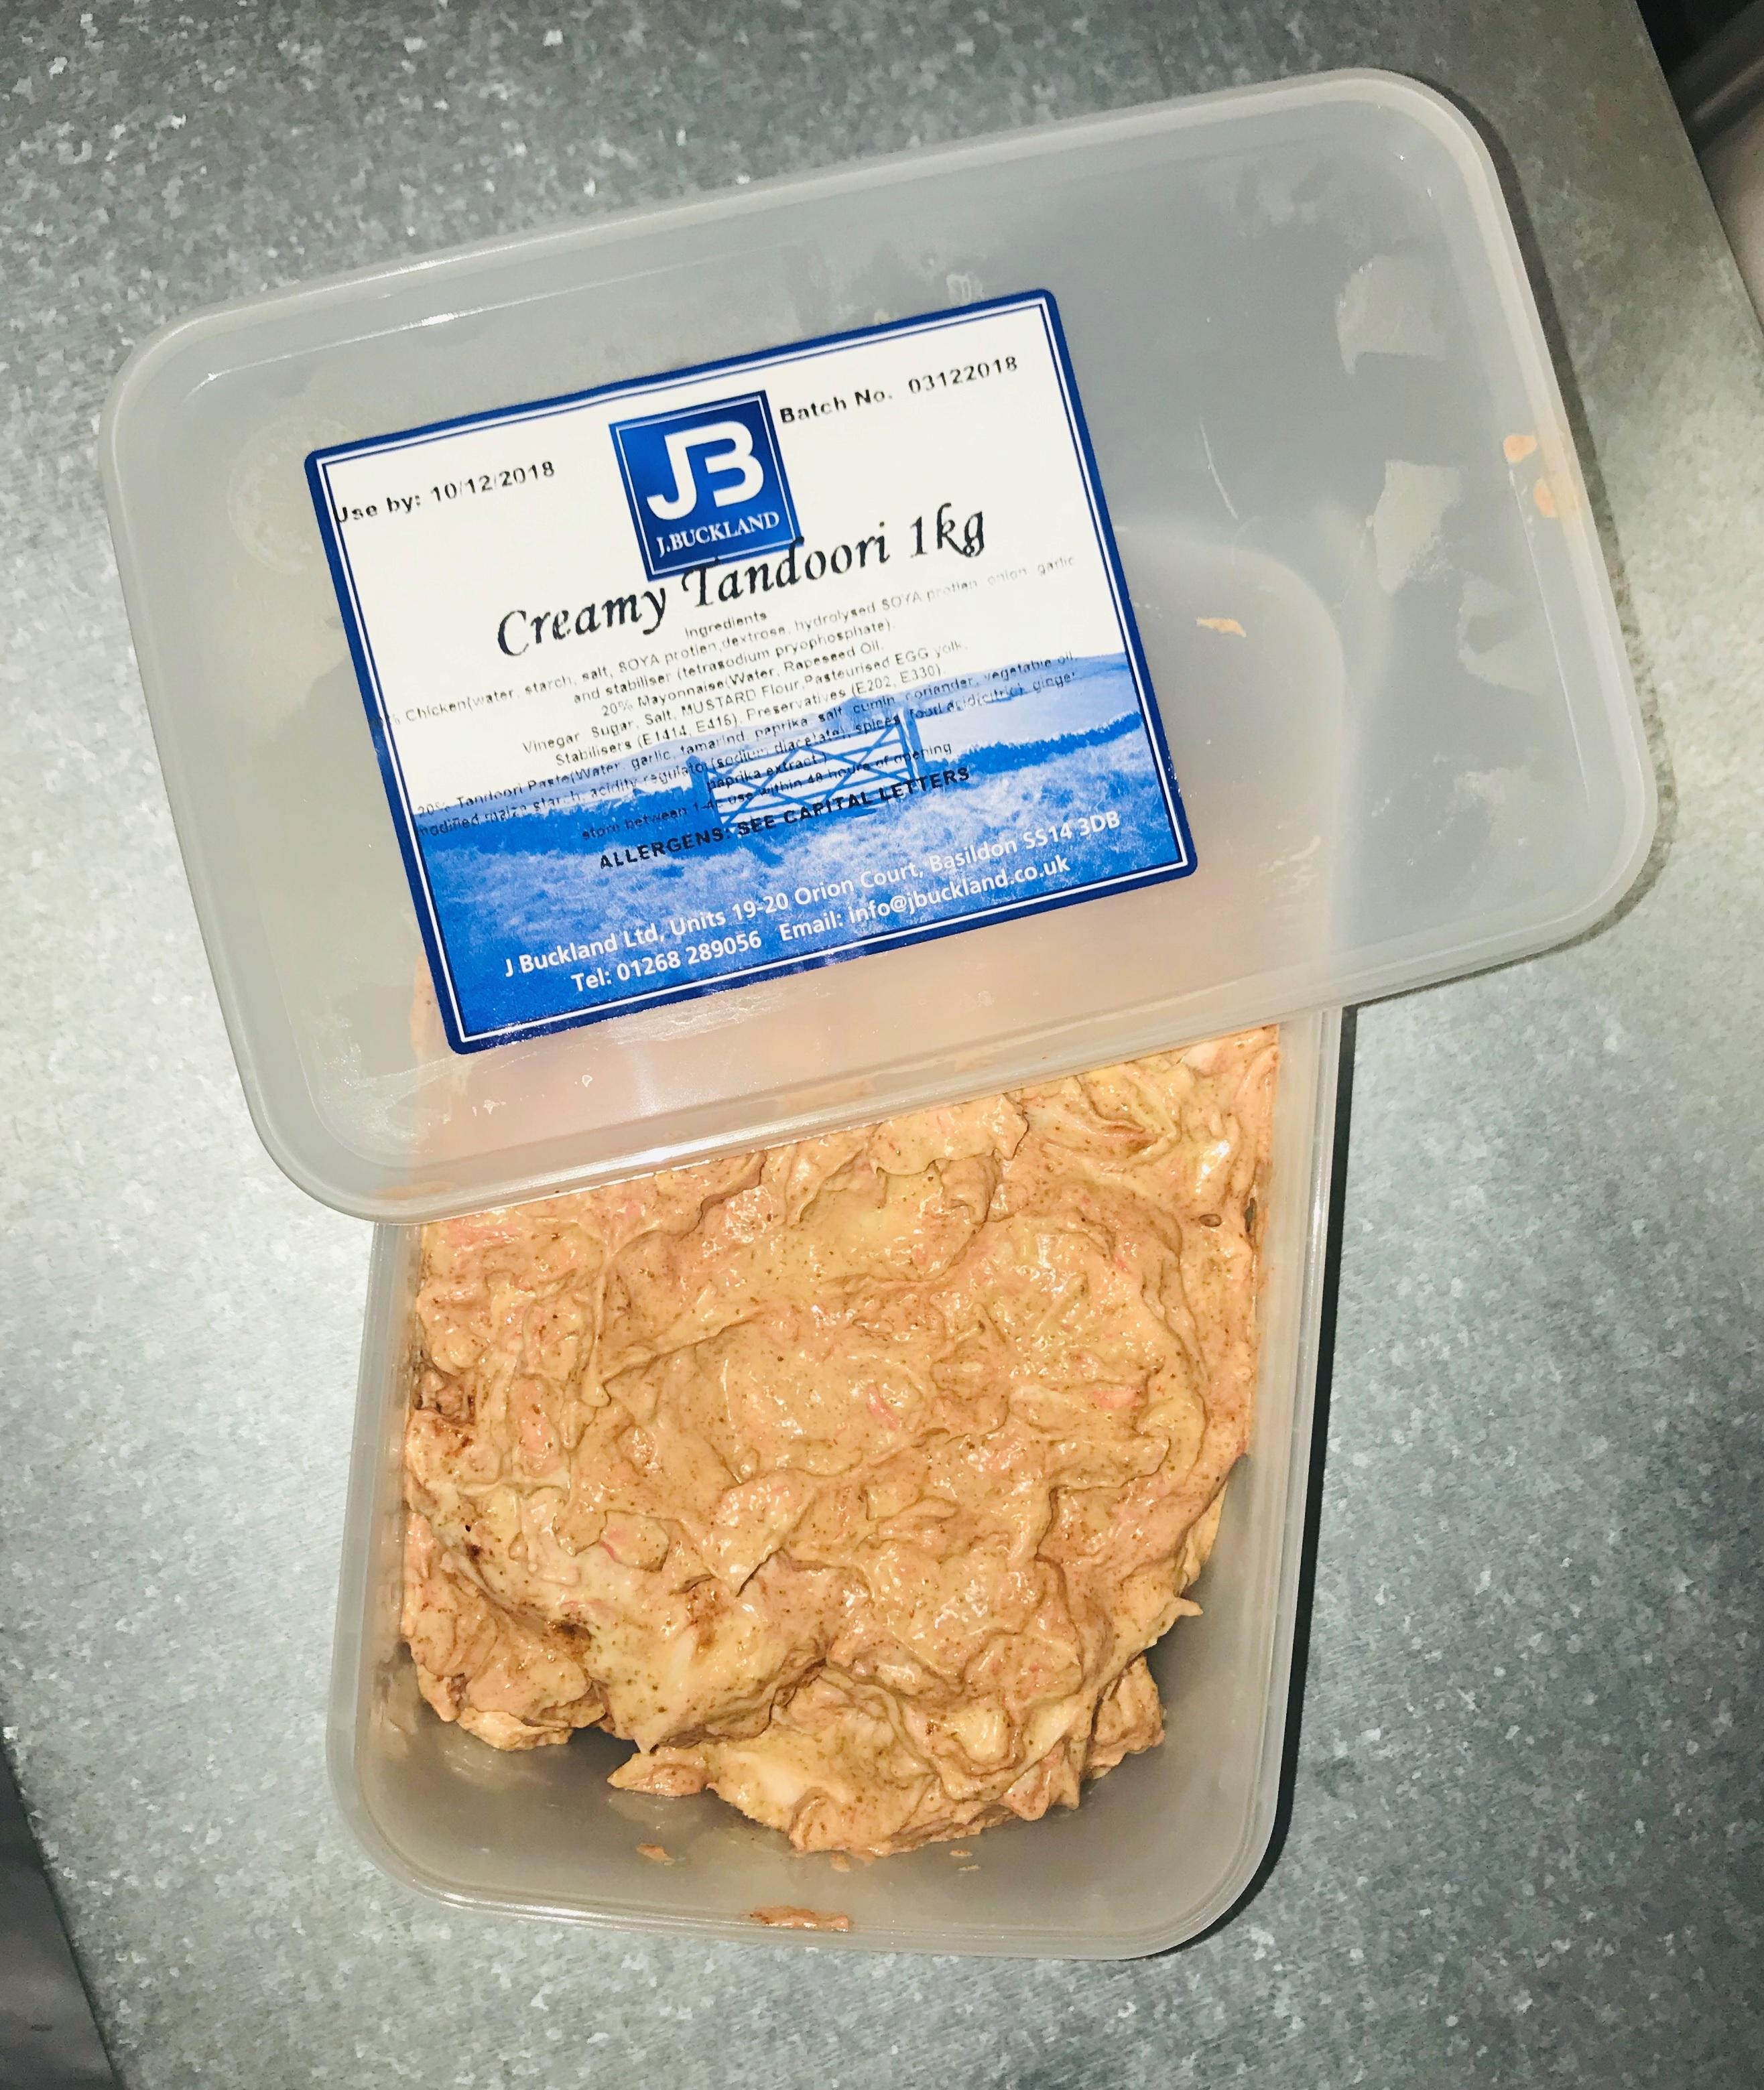 Creamy Tandoori Sandwich Filling 1kg